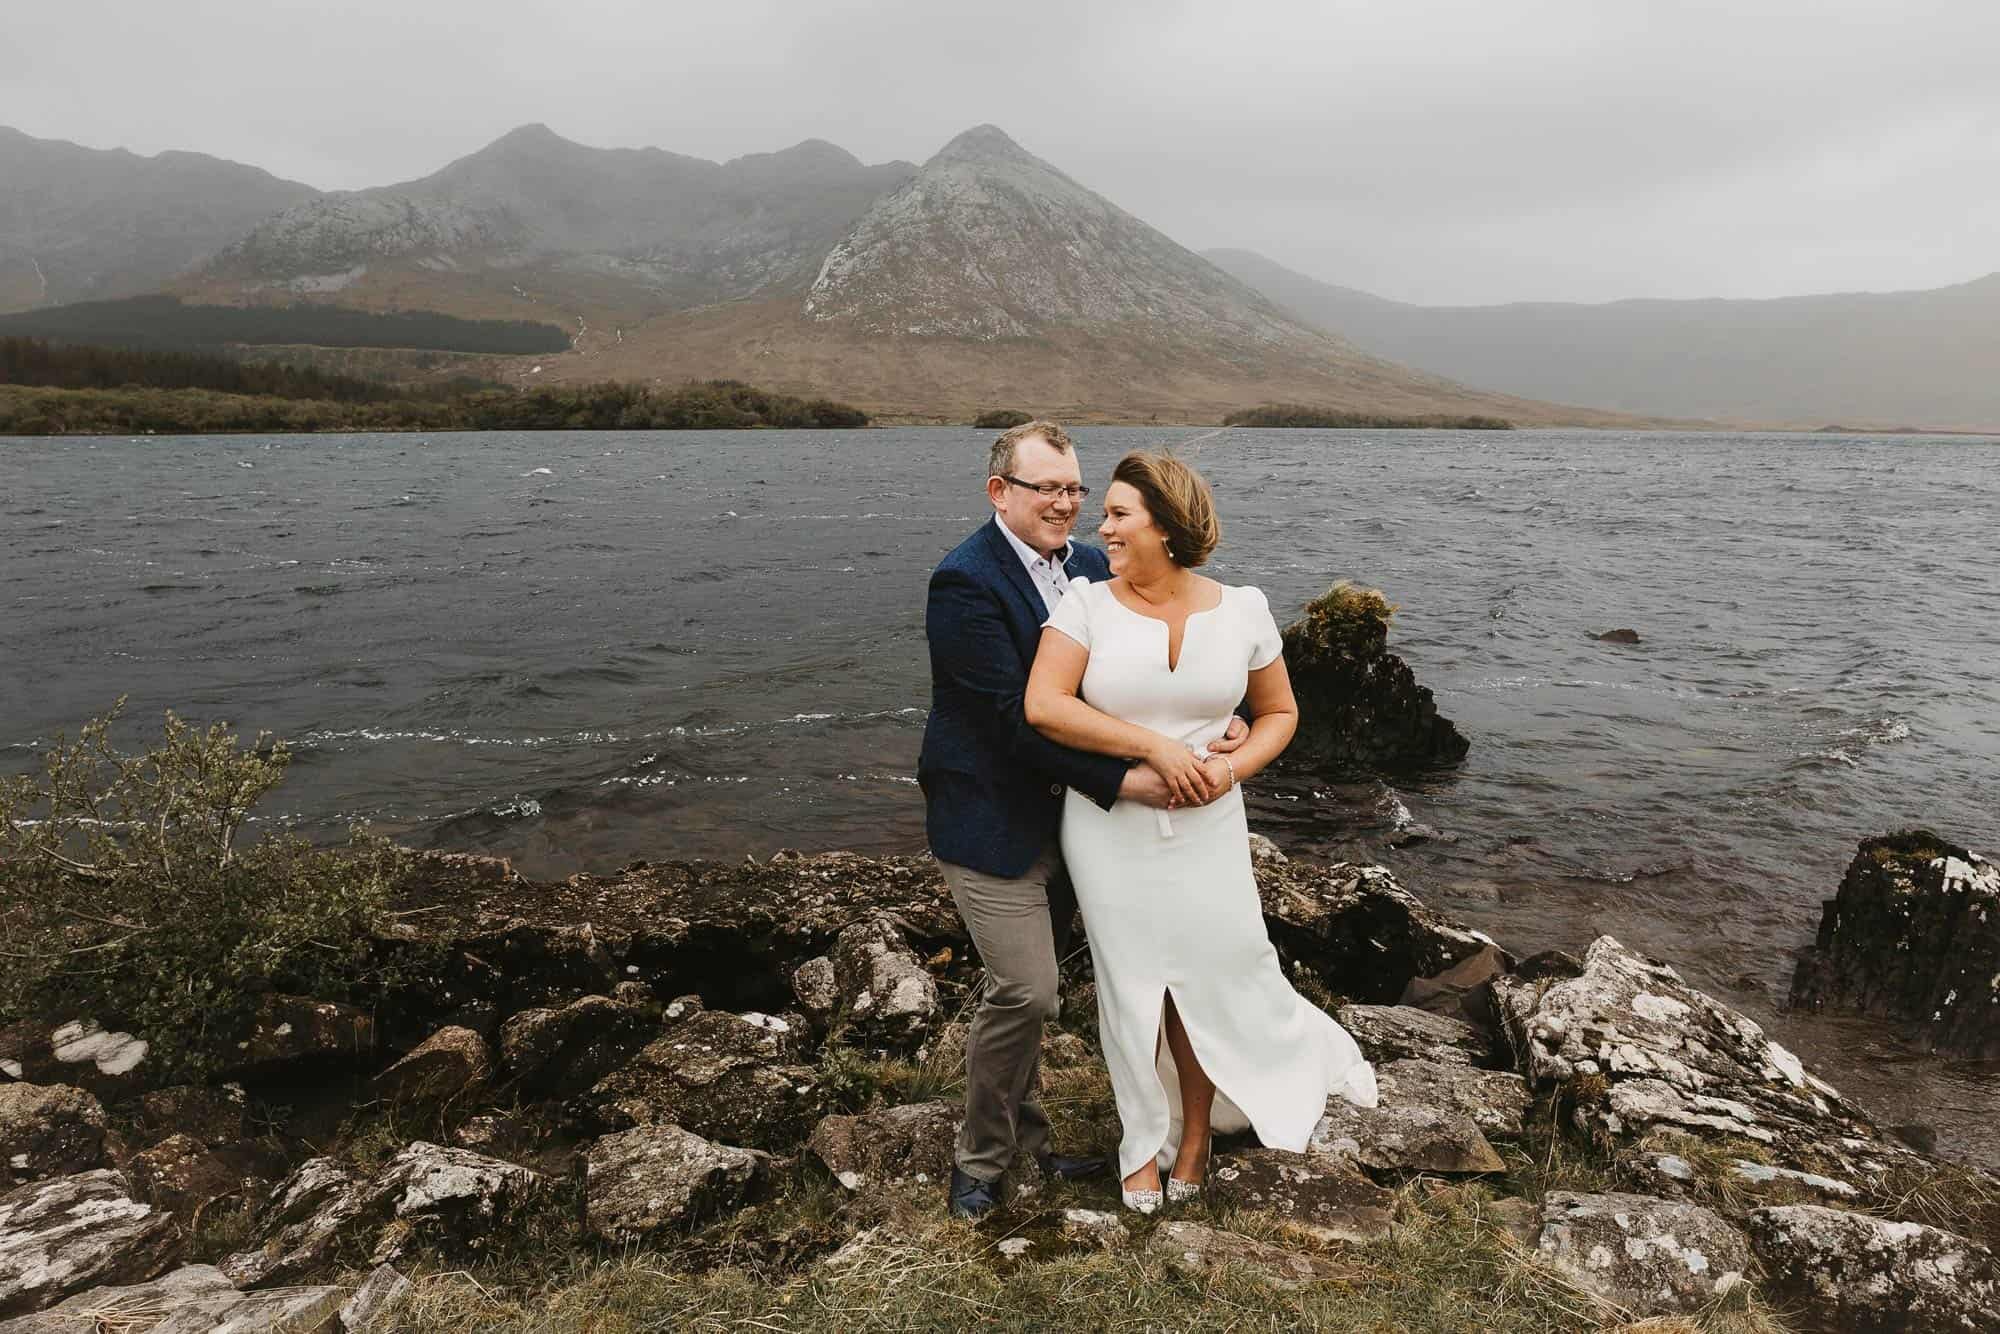 Planning for Elopements in Ireland In Love